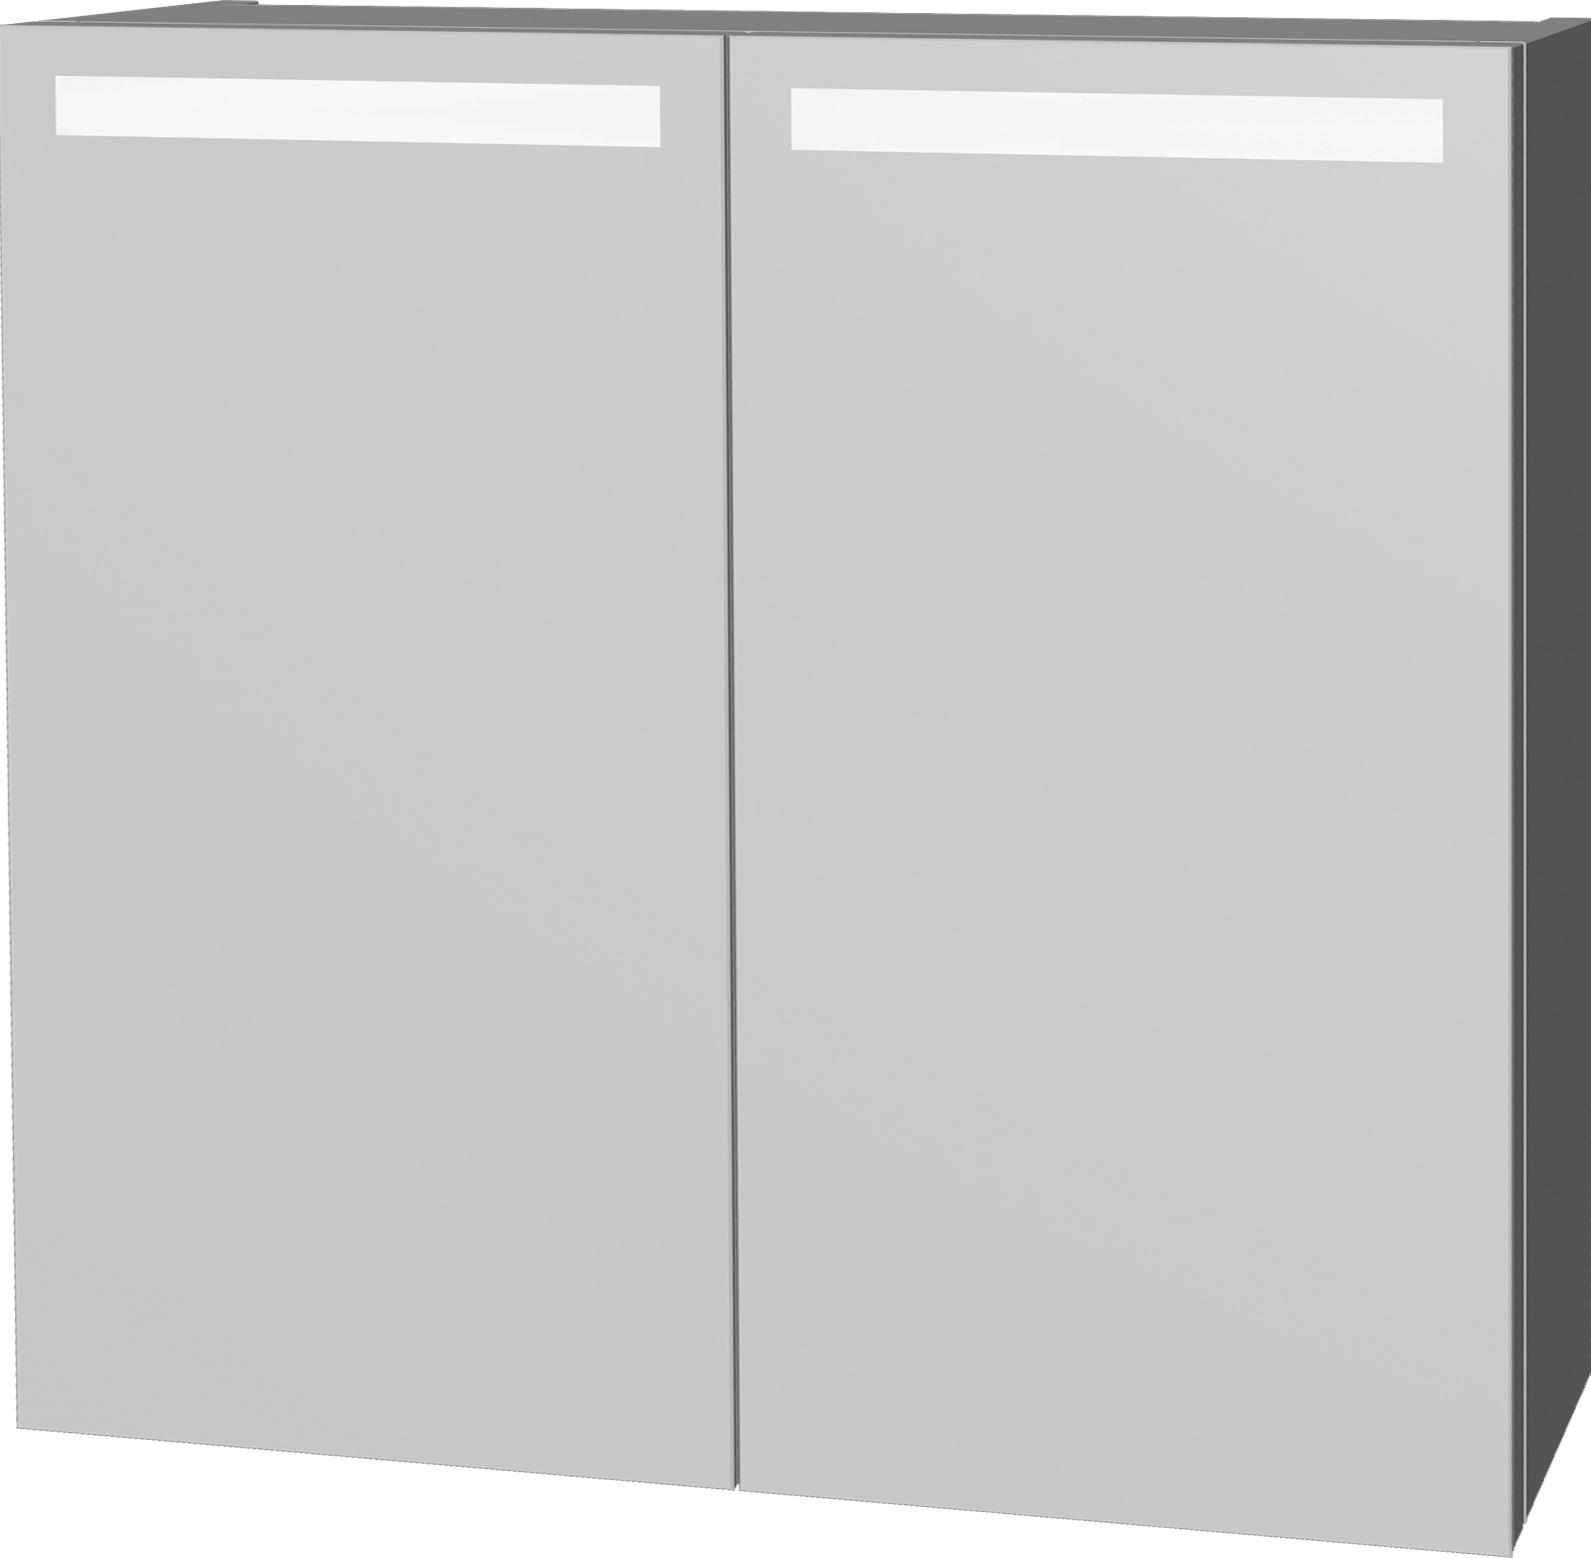 Intedoor Zrcadlová skříňka 70x72 cm, s osvětlením DZS70